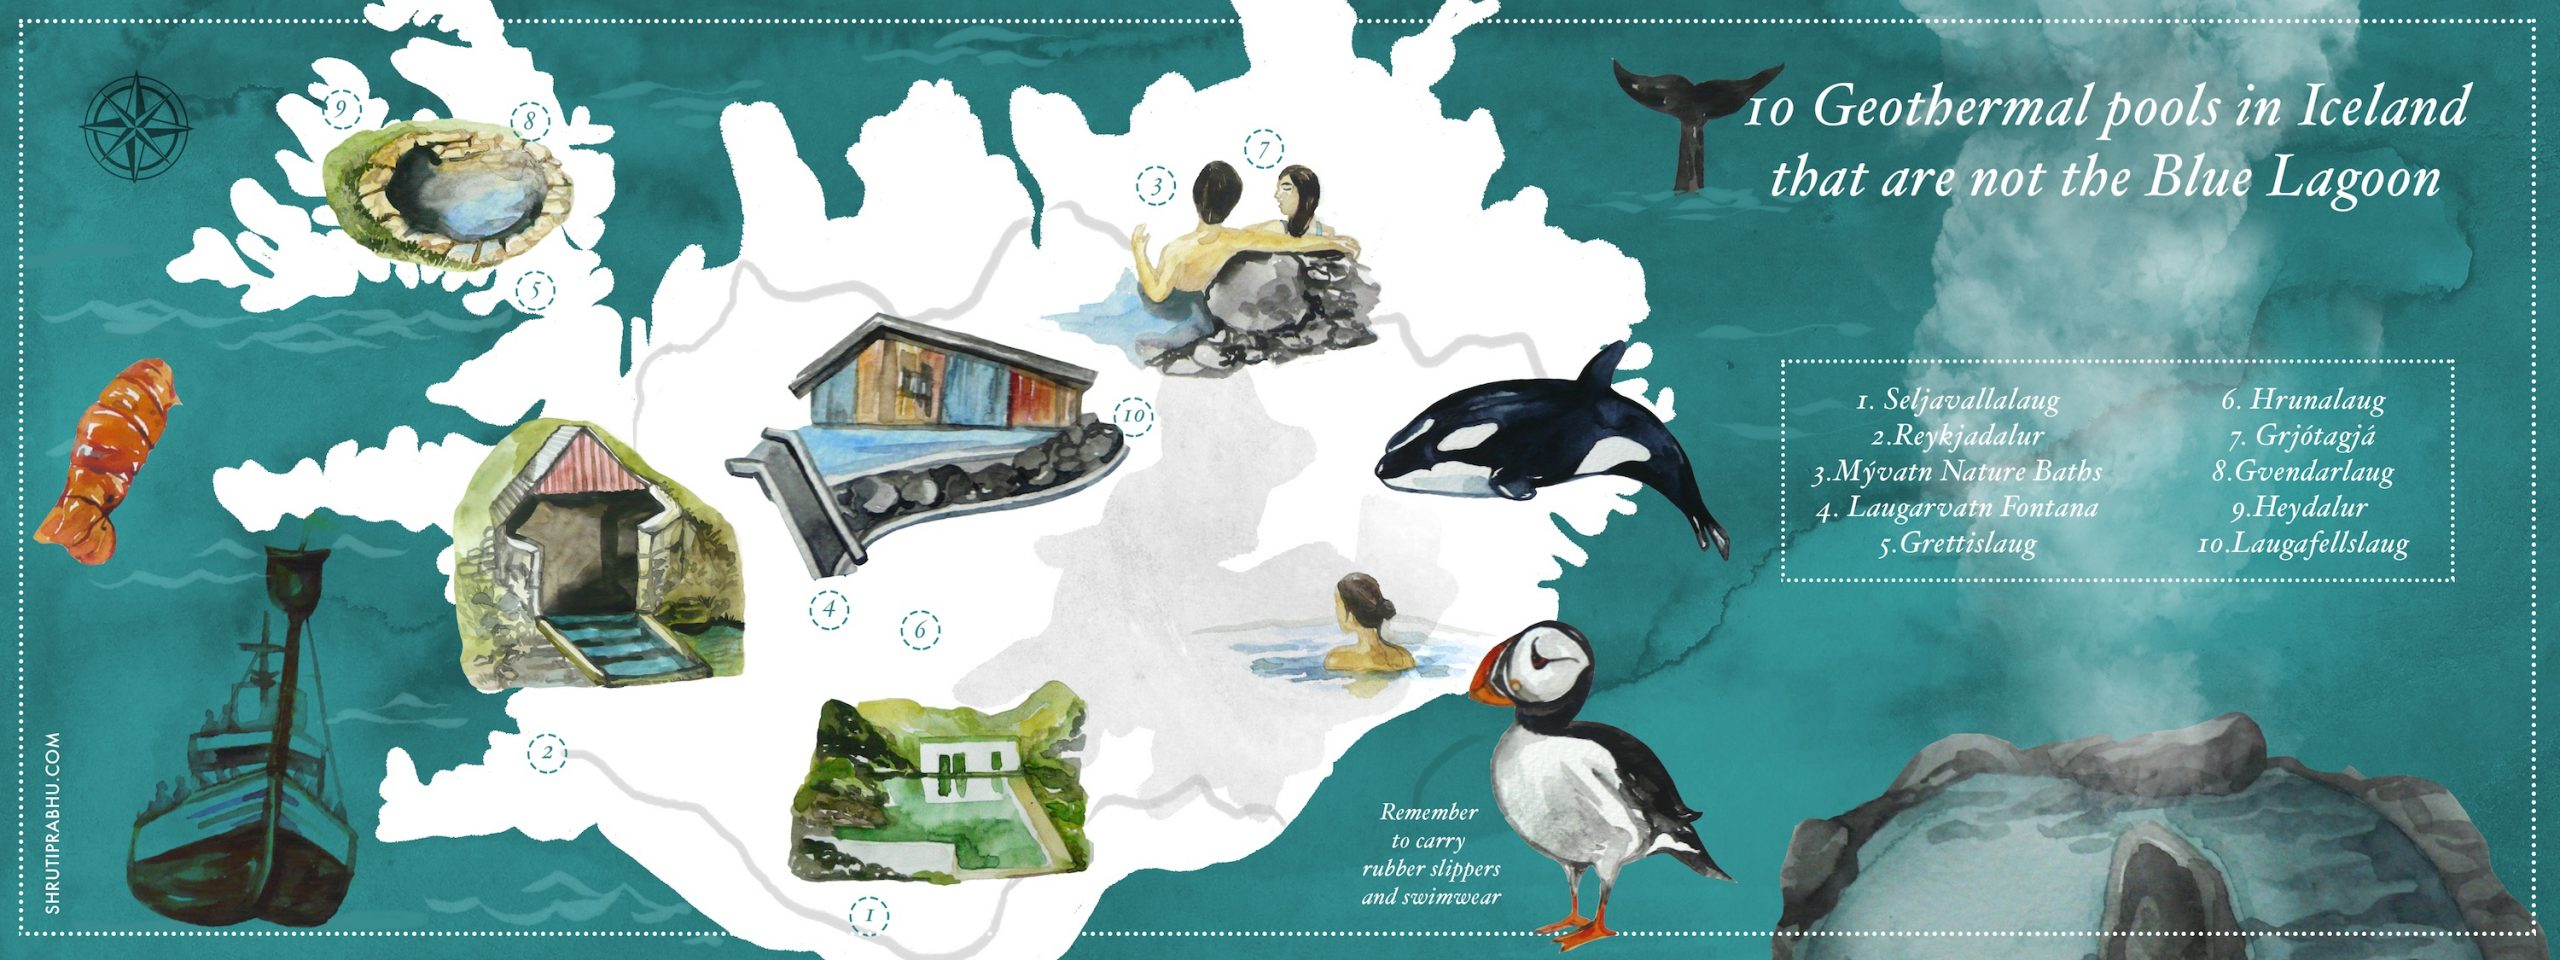 https://shrutiprabhu.com/wp-content/uploads/2020/08/shrutiprabhu_Icelandmap_books_IllustratedMaps_TDAT-scaled.jpg